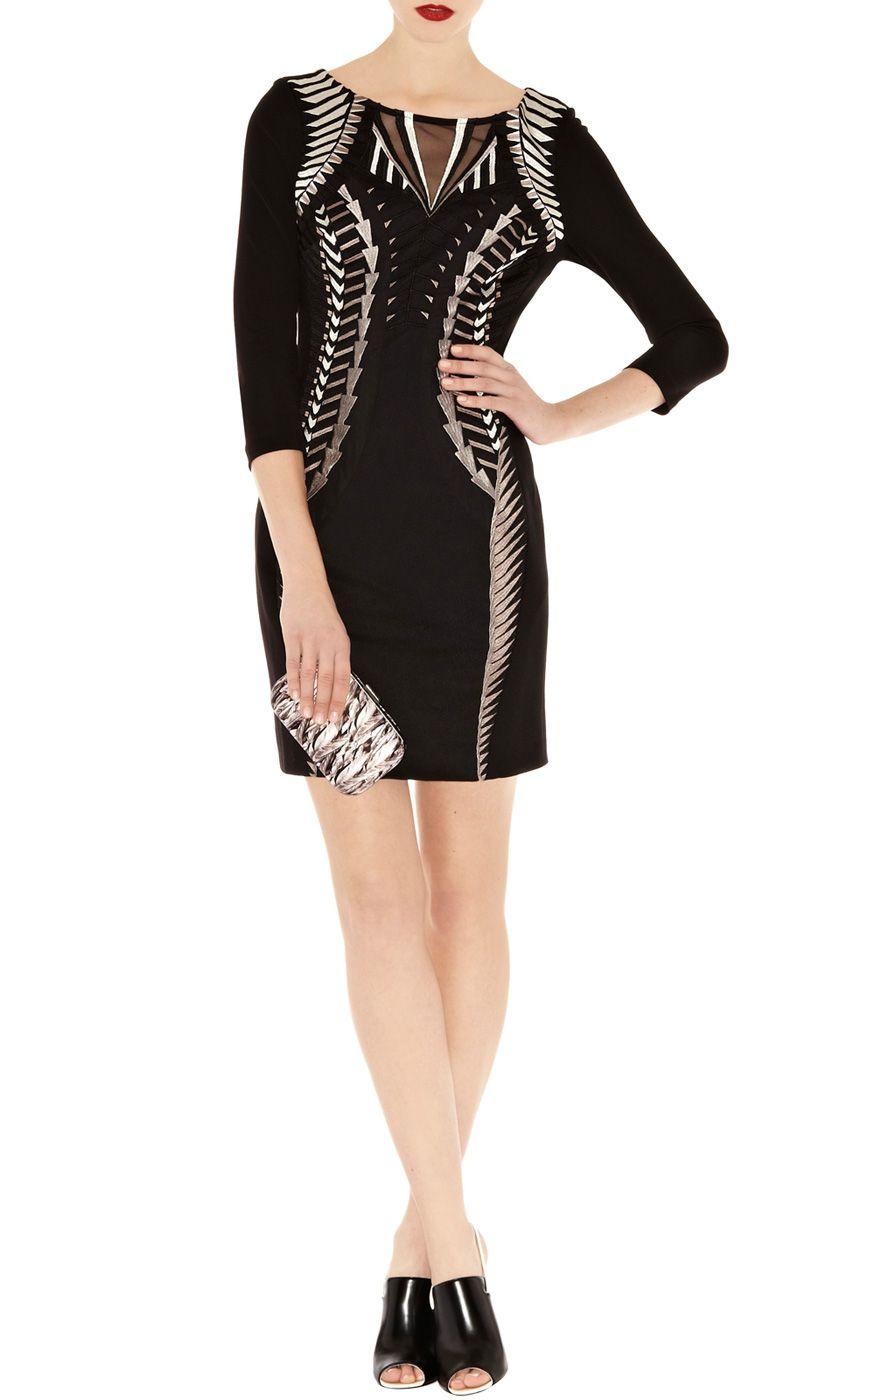 Black dress karen millen -  Black Multi Karen Millen Geometric Tribal Embroidery Dress